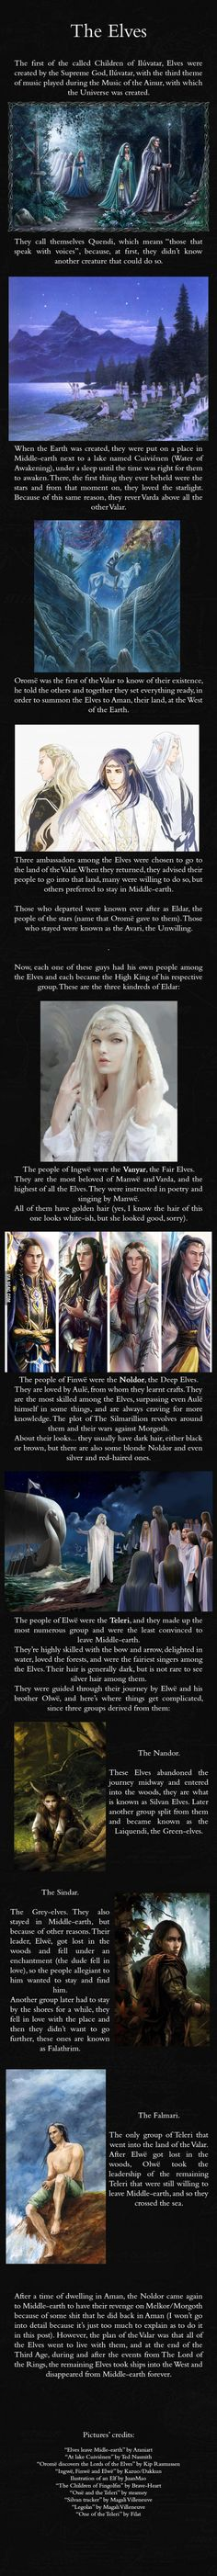 Elves Origins